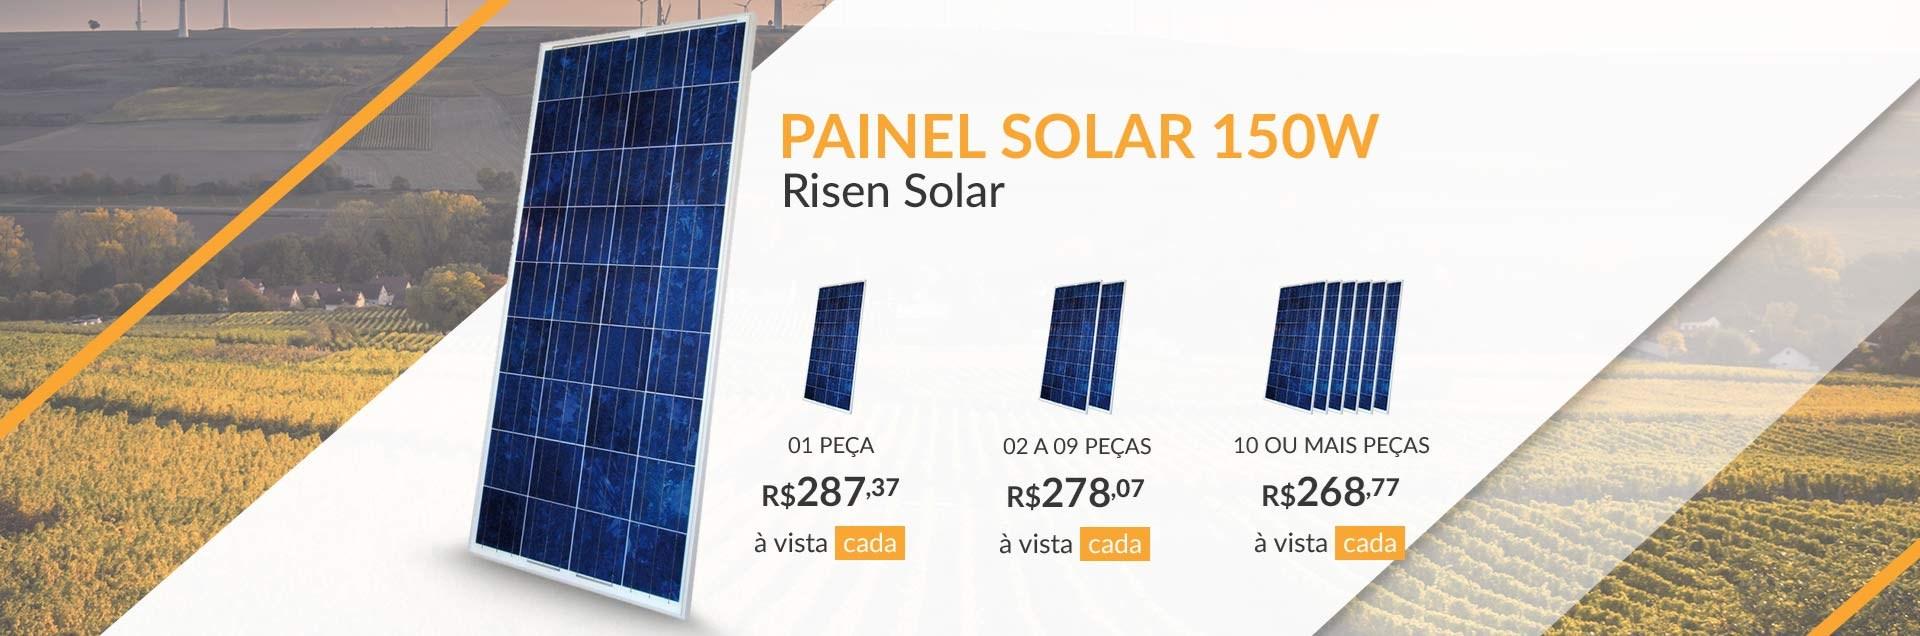 Painel Solar Risen 150W